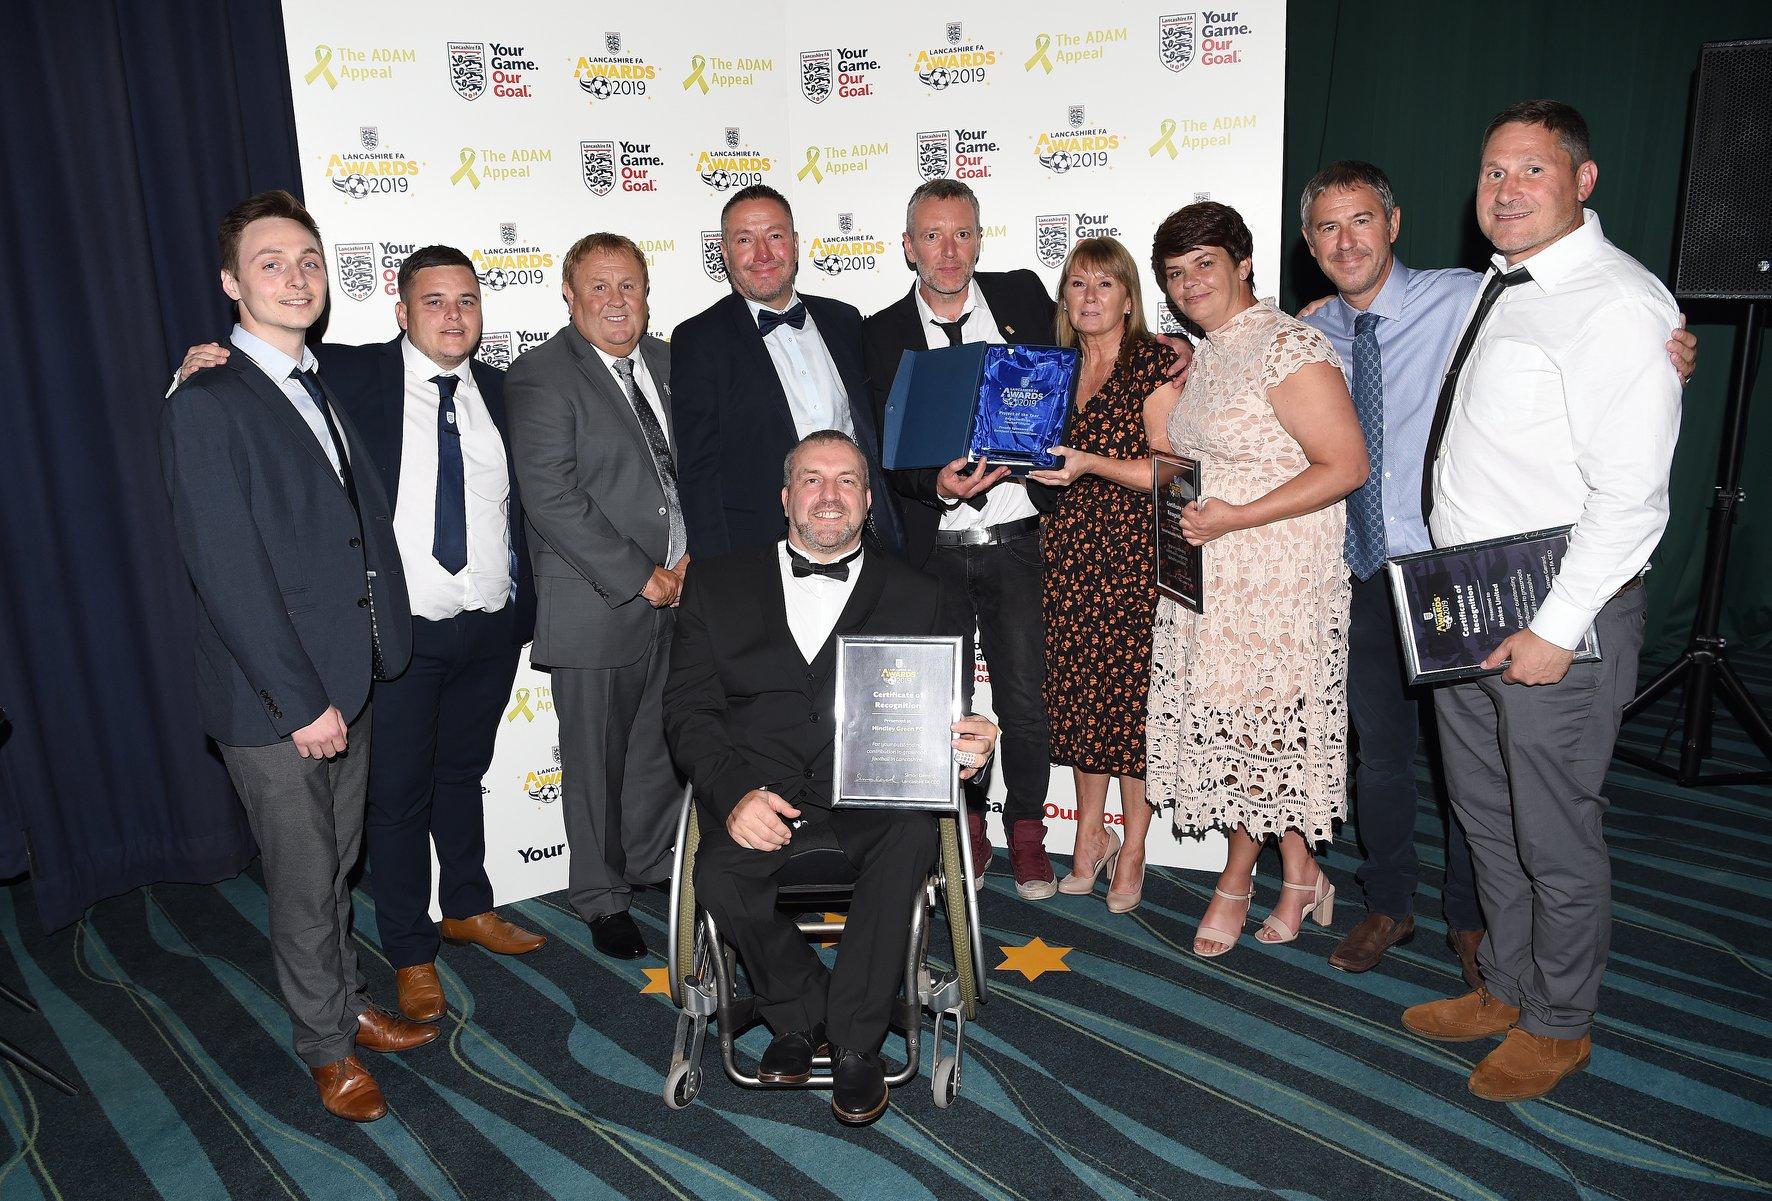 News release – Football league tackling mental health issues wins FA award